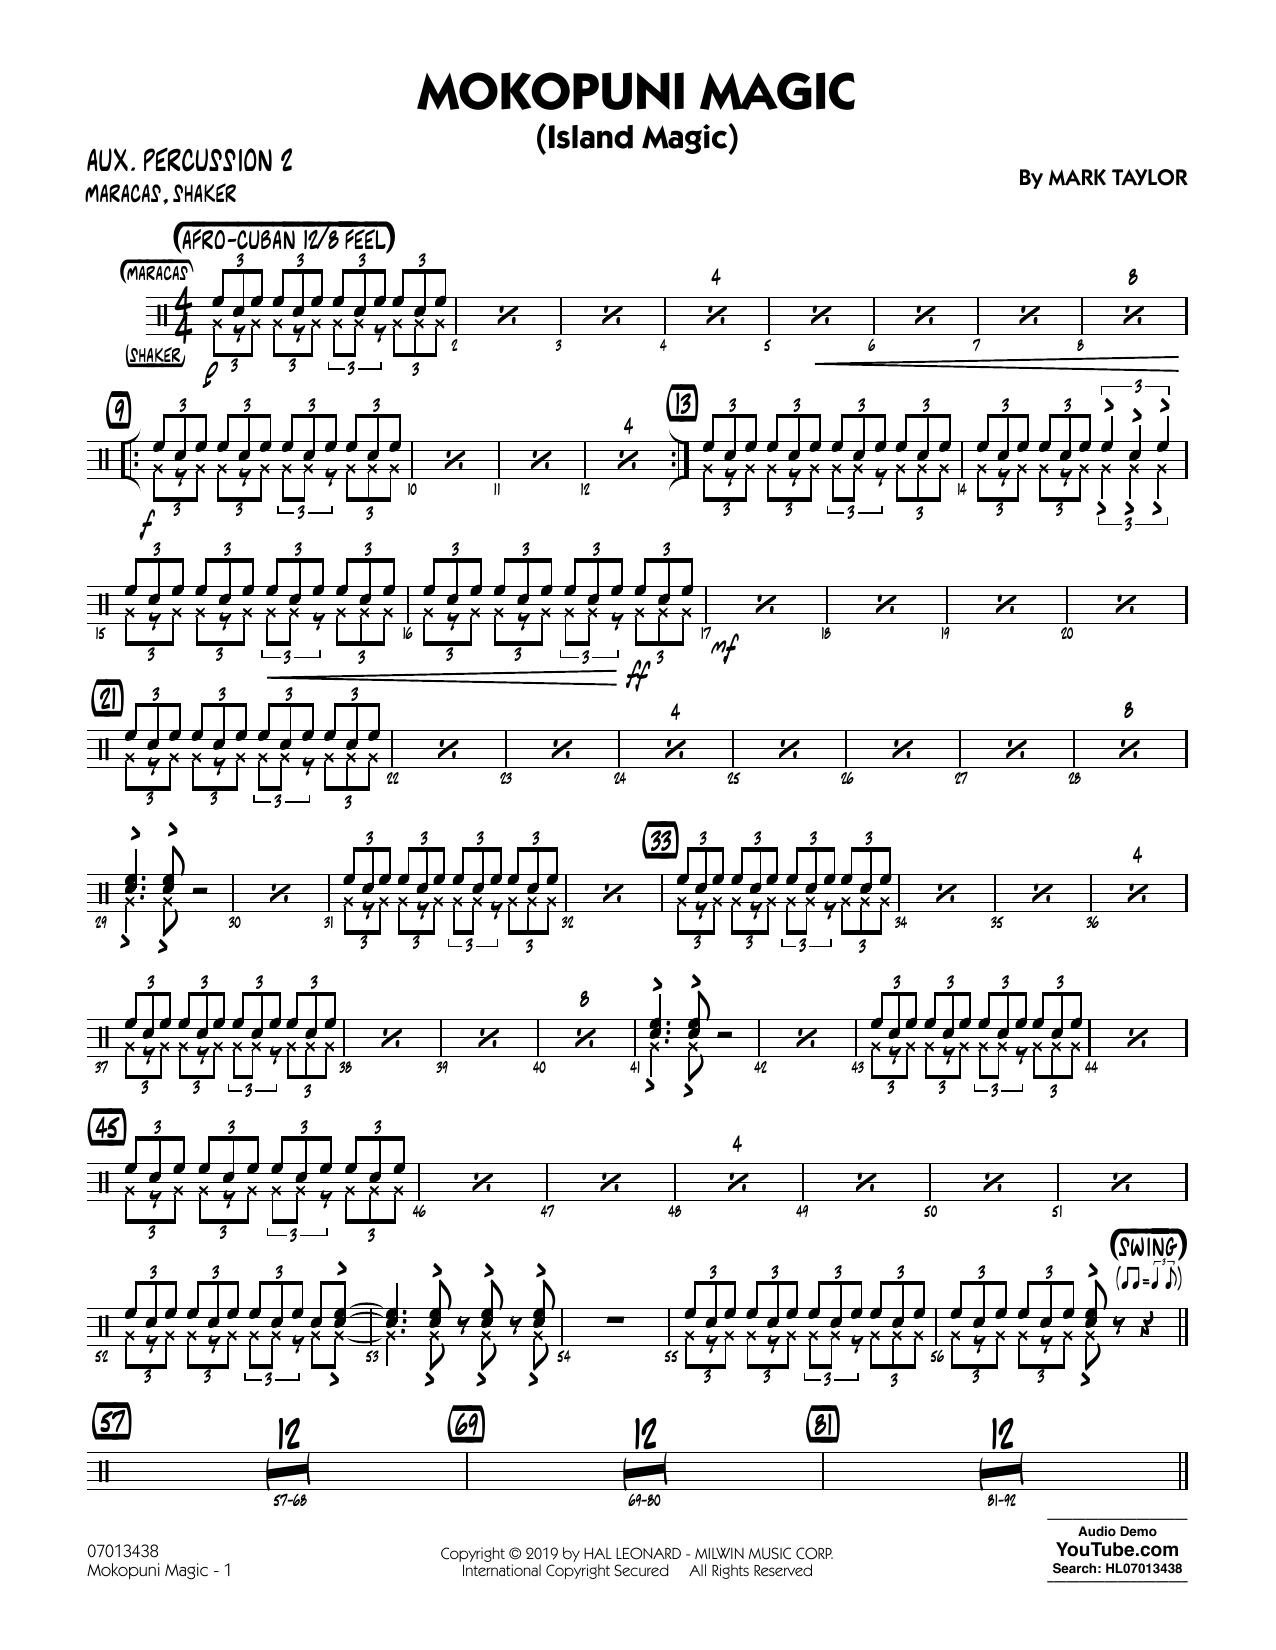 Mark Taylor Mokopuni Magic (Island Magic) - Aux. Percussion 2 sheet music notes and chords. Download Printable PDF.